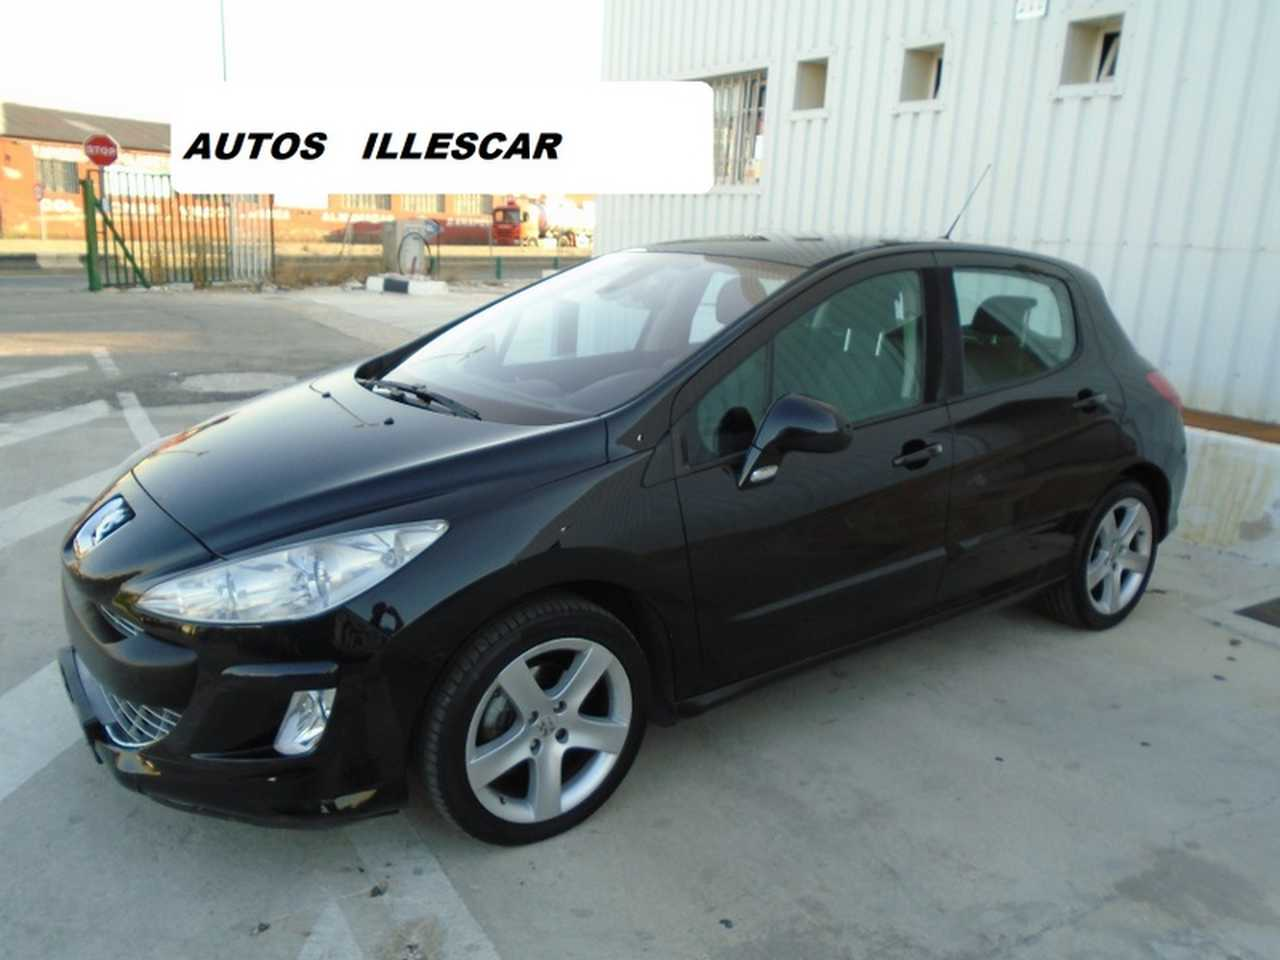 Peugeot 308 1.6 HDI 110 CV MUY CUIDADO  - Foto 1